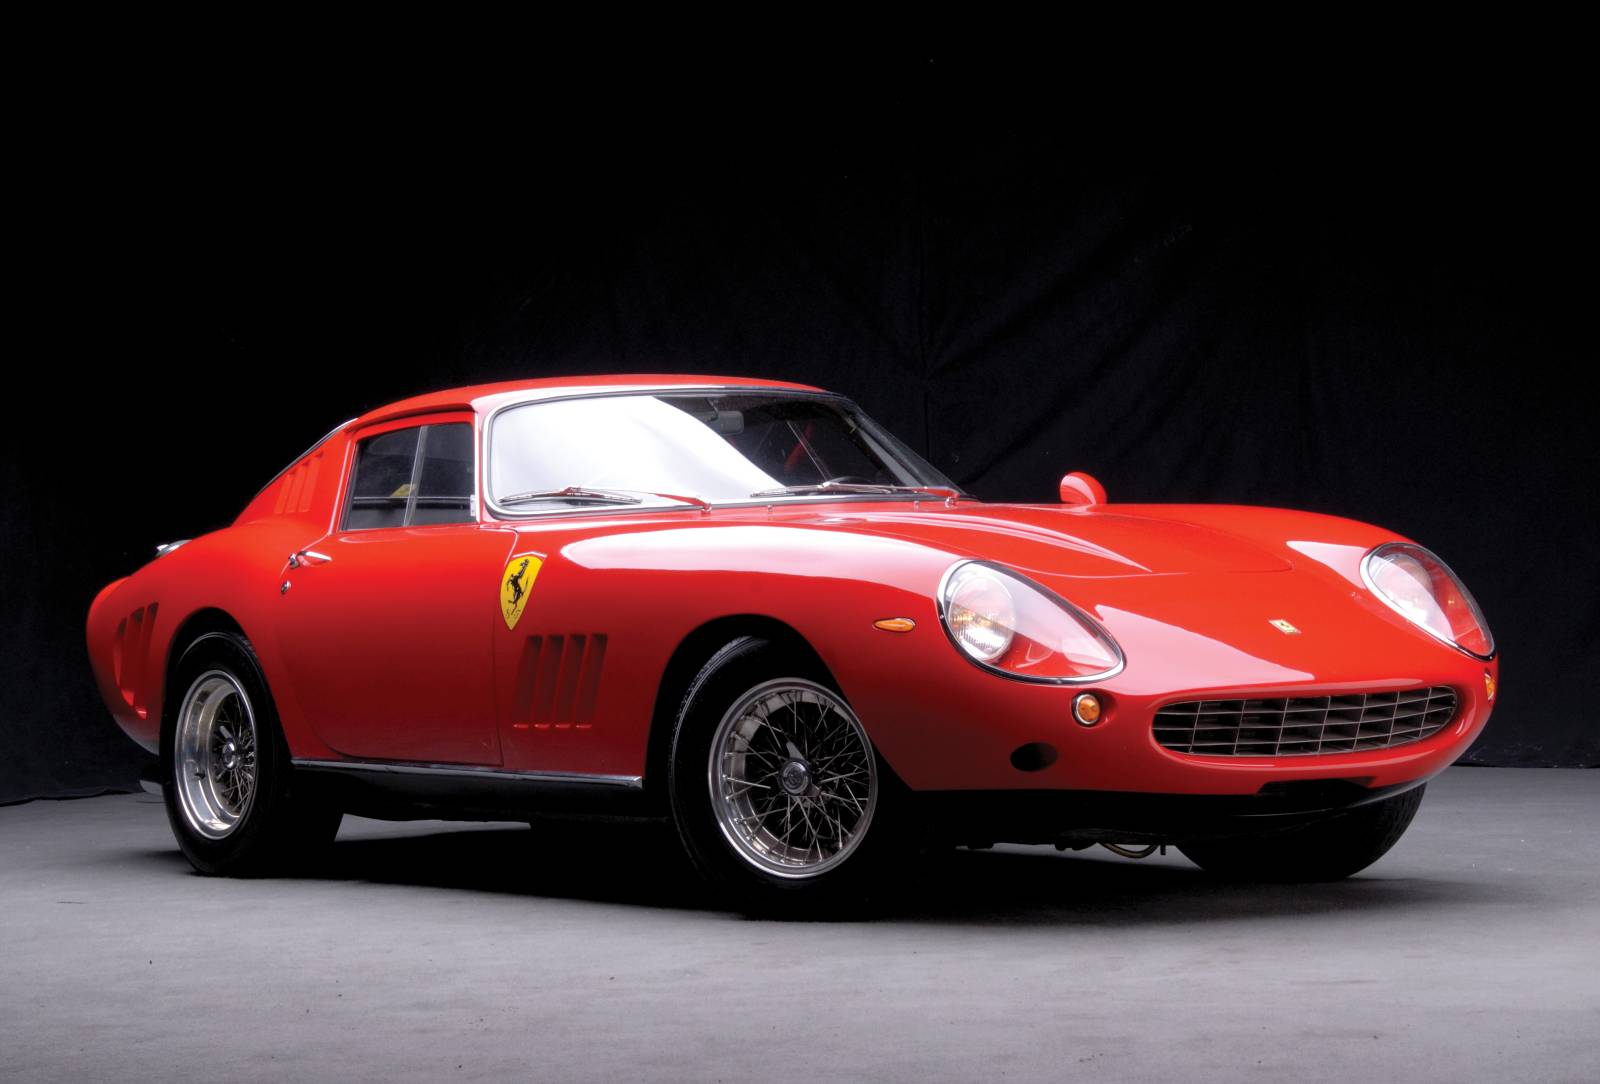 1966 Ferrari 275 Gtb Classic Automobiles